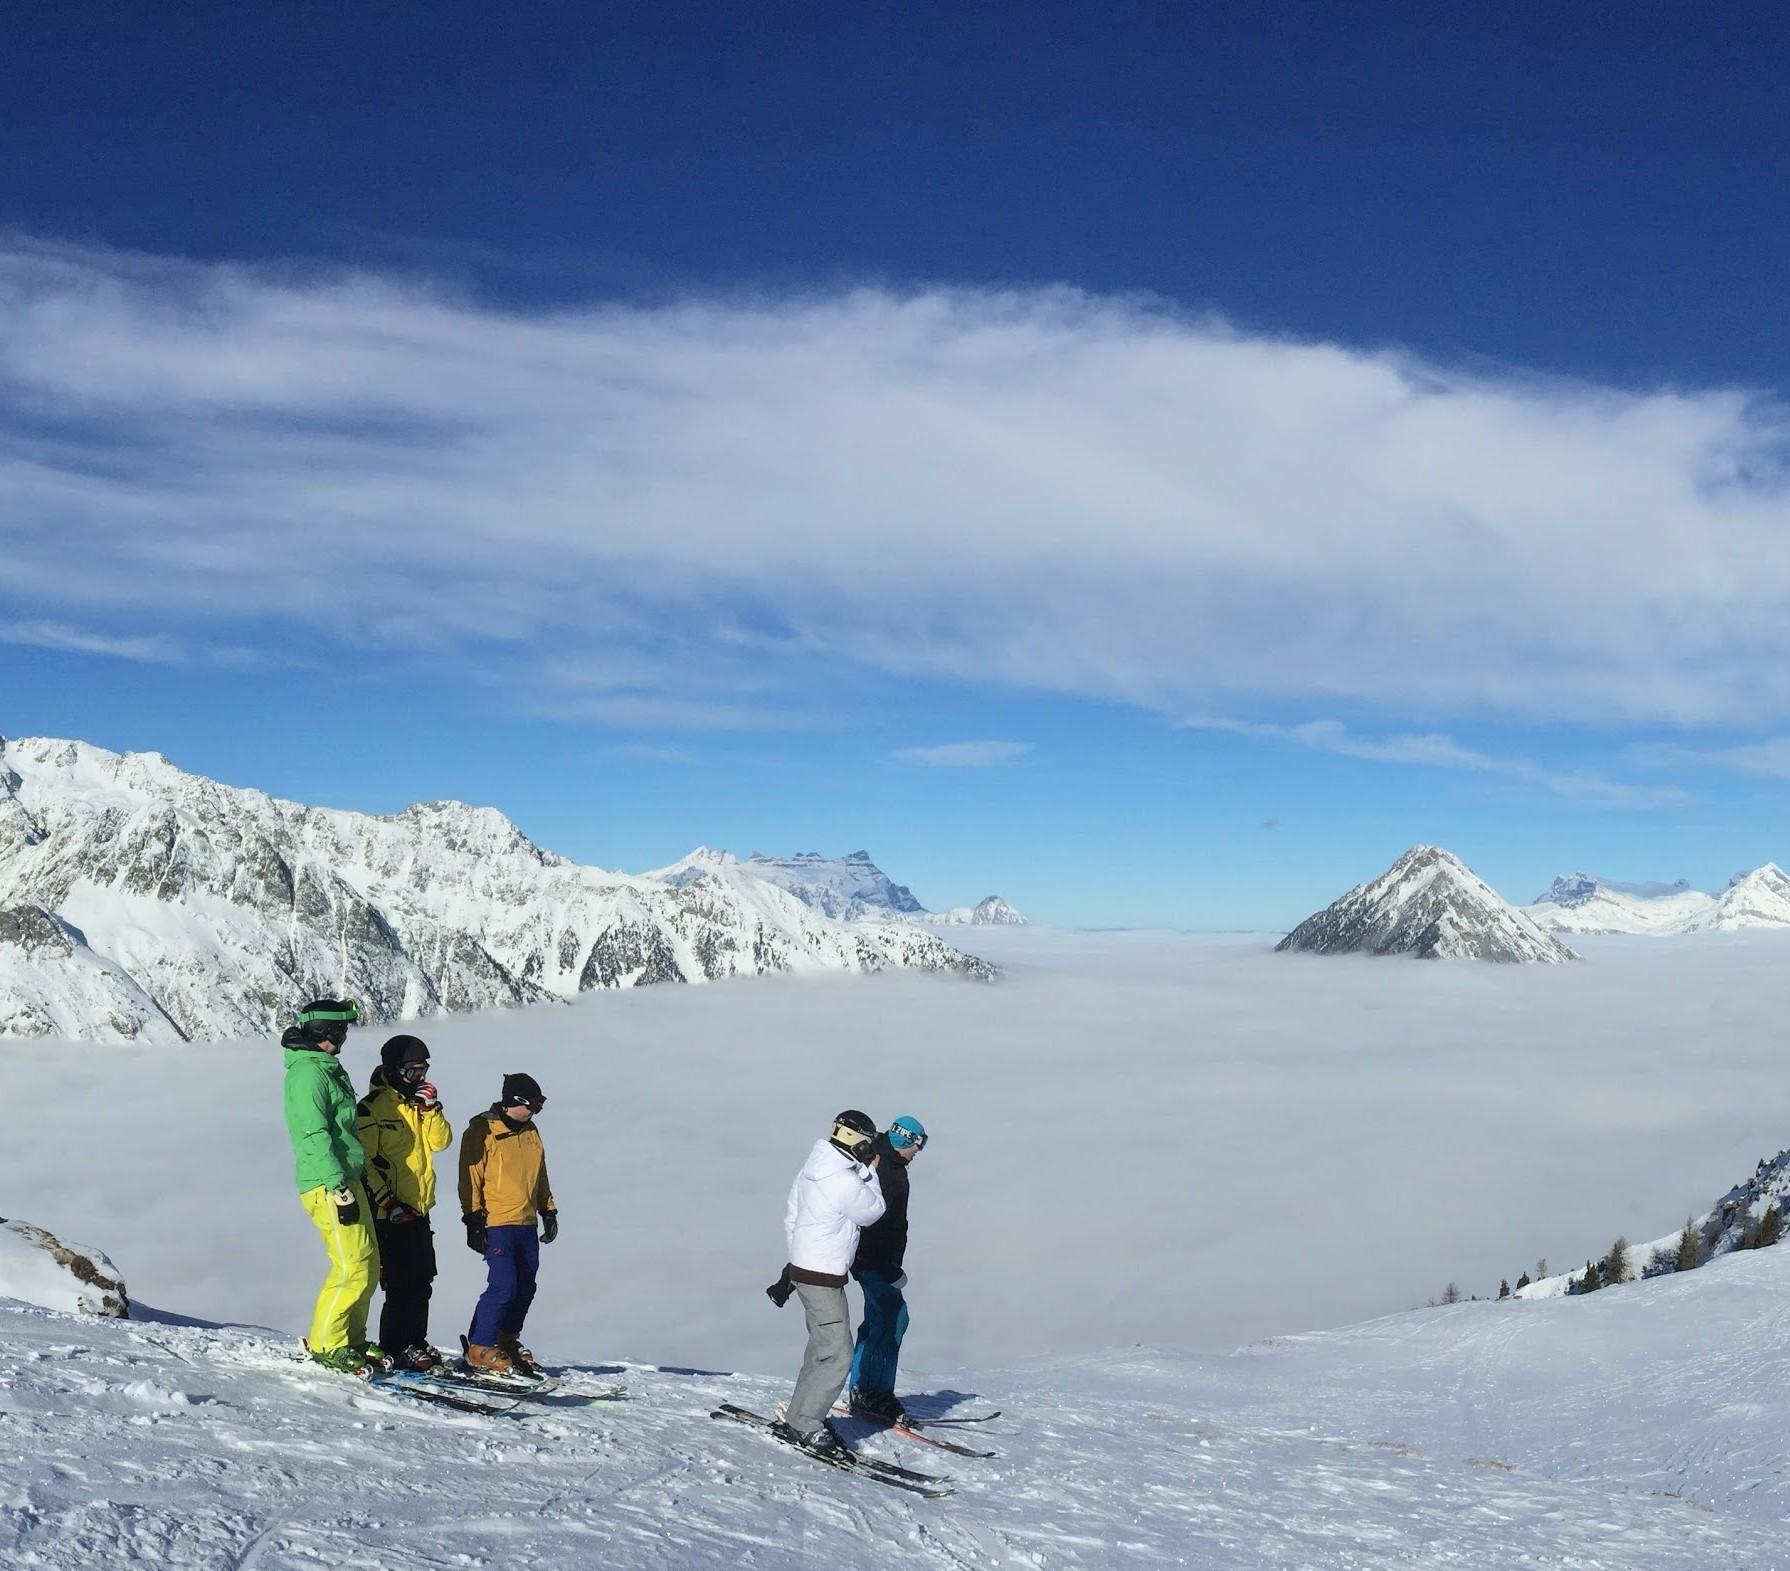 Private Ski lessons Full Day